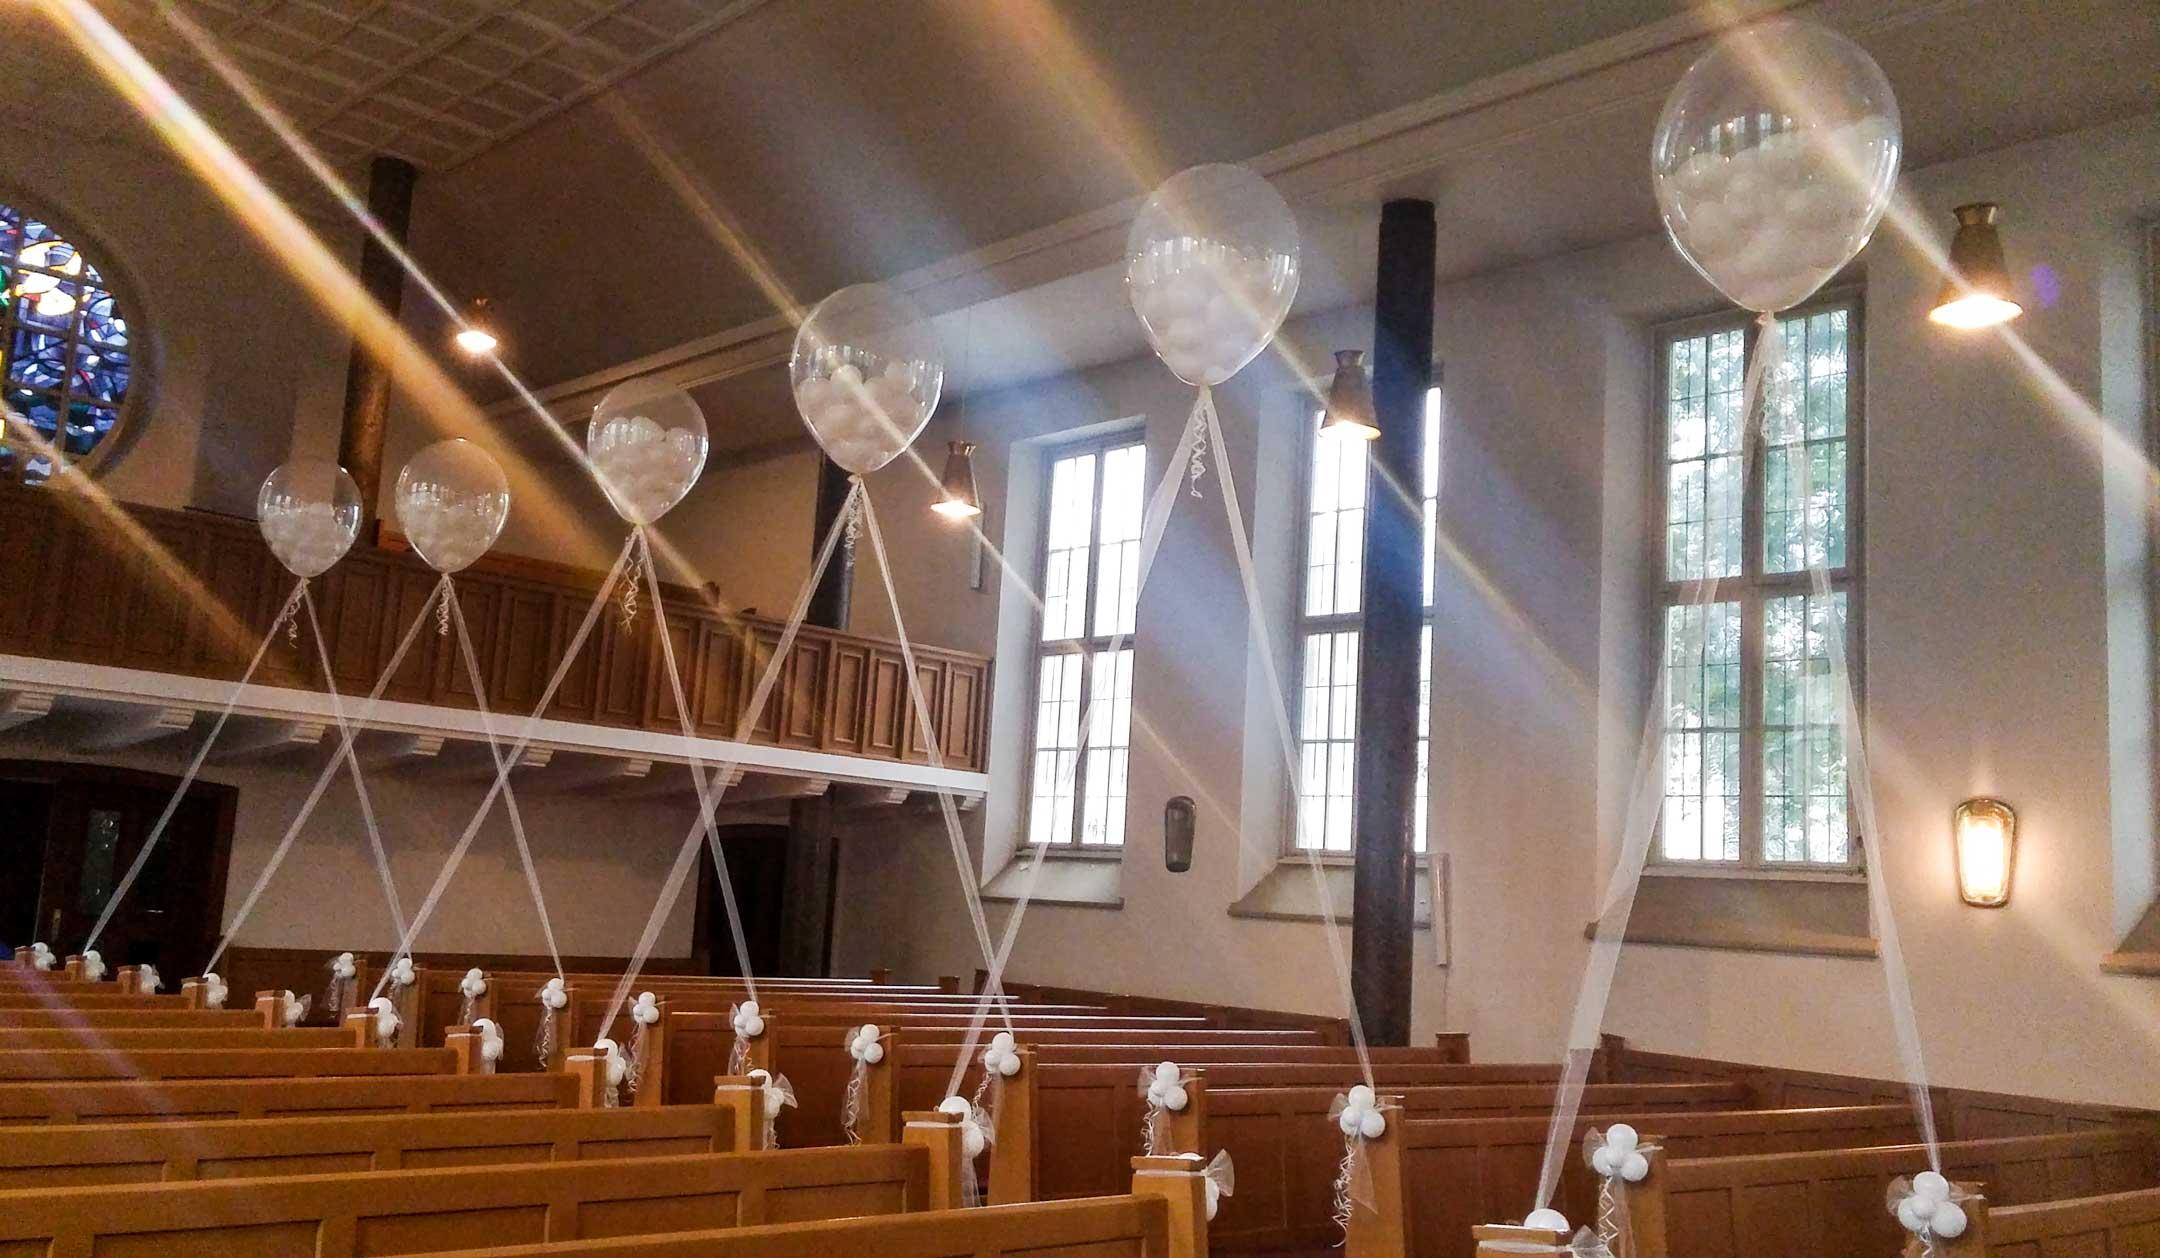 luftballons zum verschenken lufties ballons. Black Bedroom Furniture Sets. Home Design Ideas